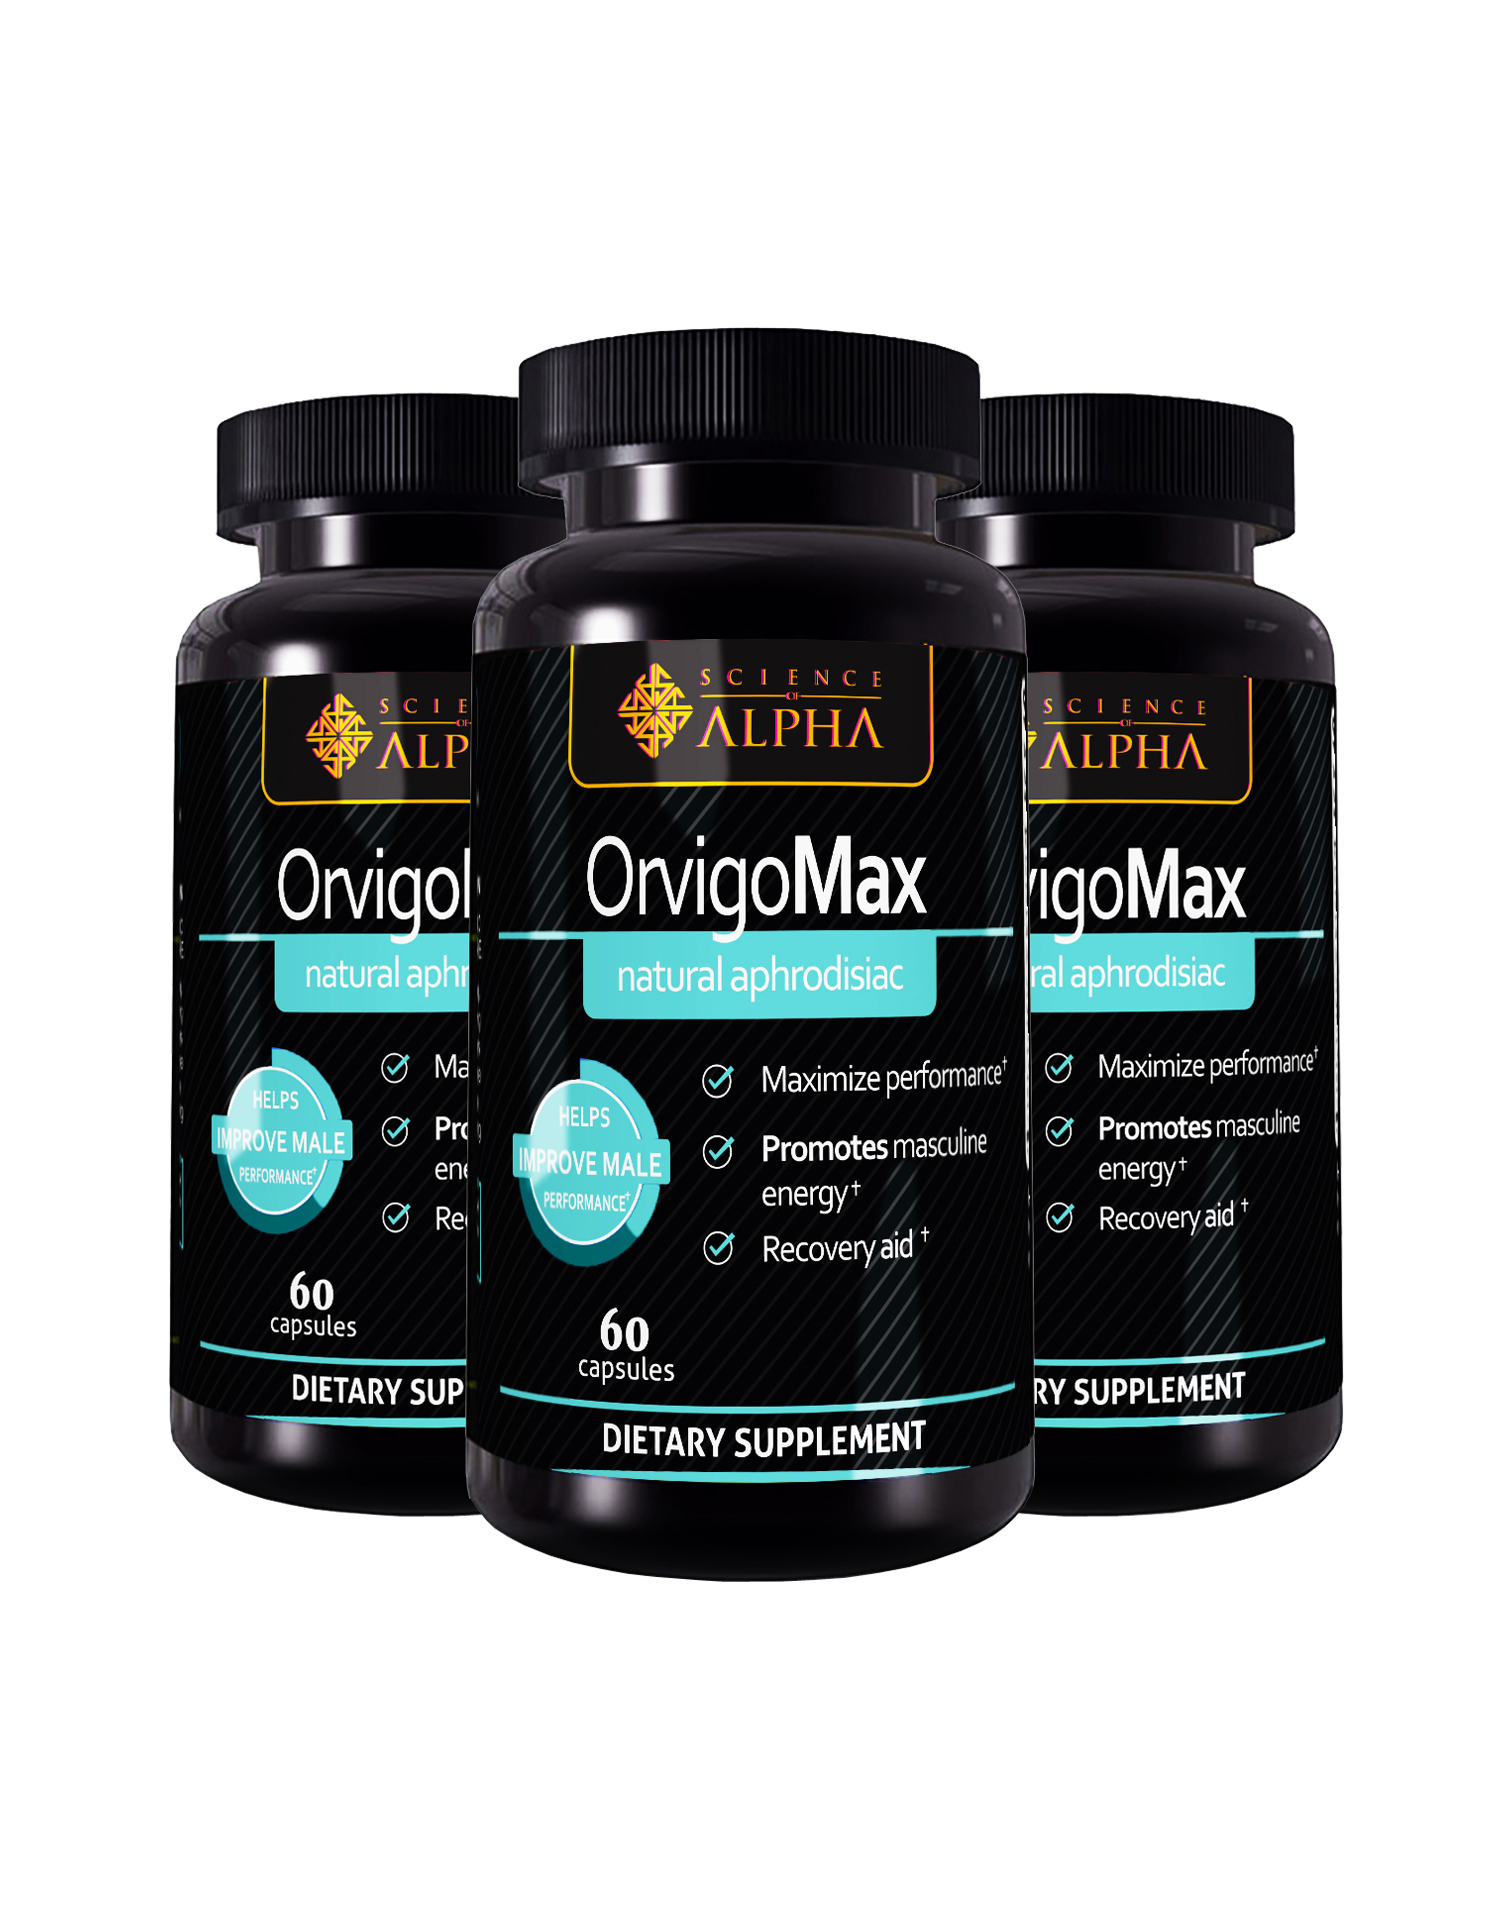 Orvigomax